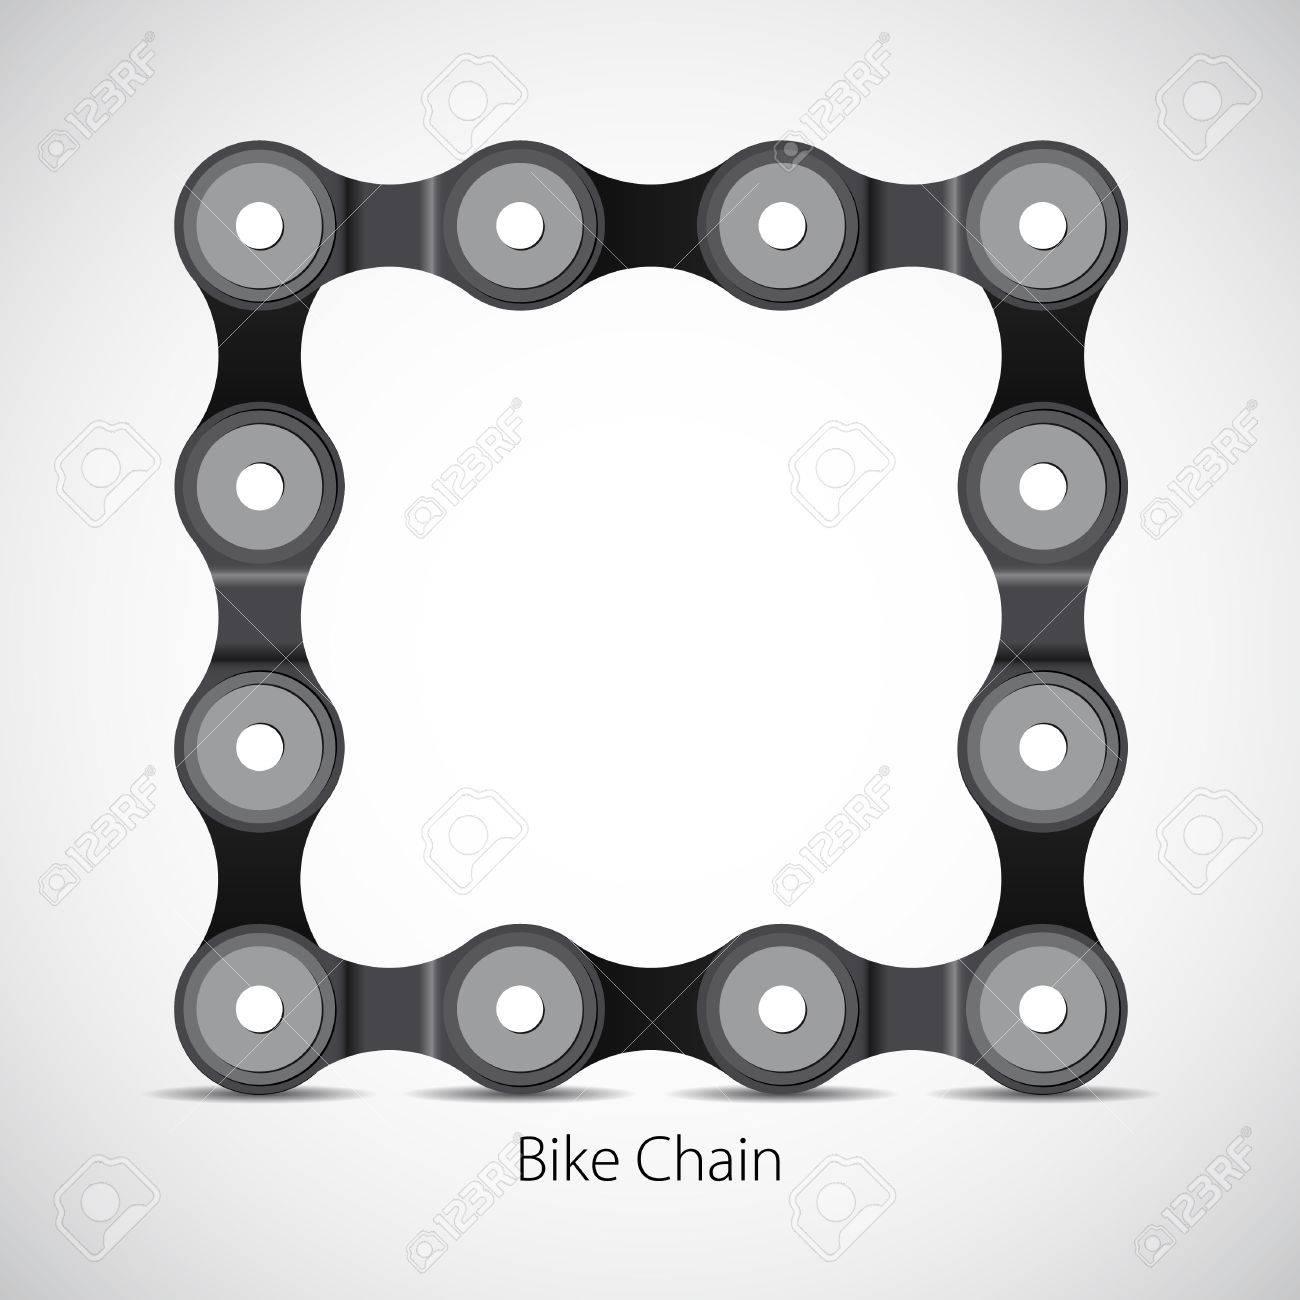 Bicycle Chain, Bike Box Frame, Vector Card Symbol Royalty Free ...